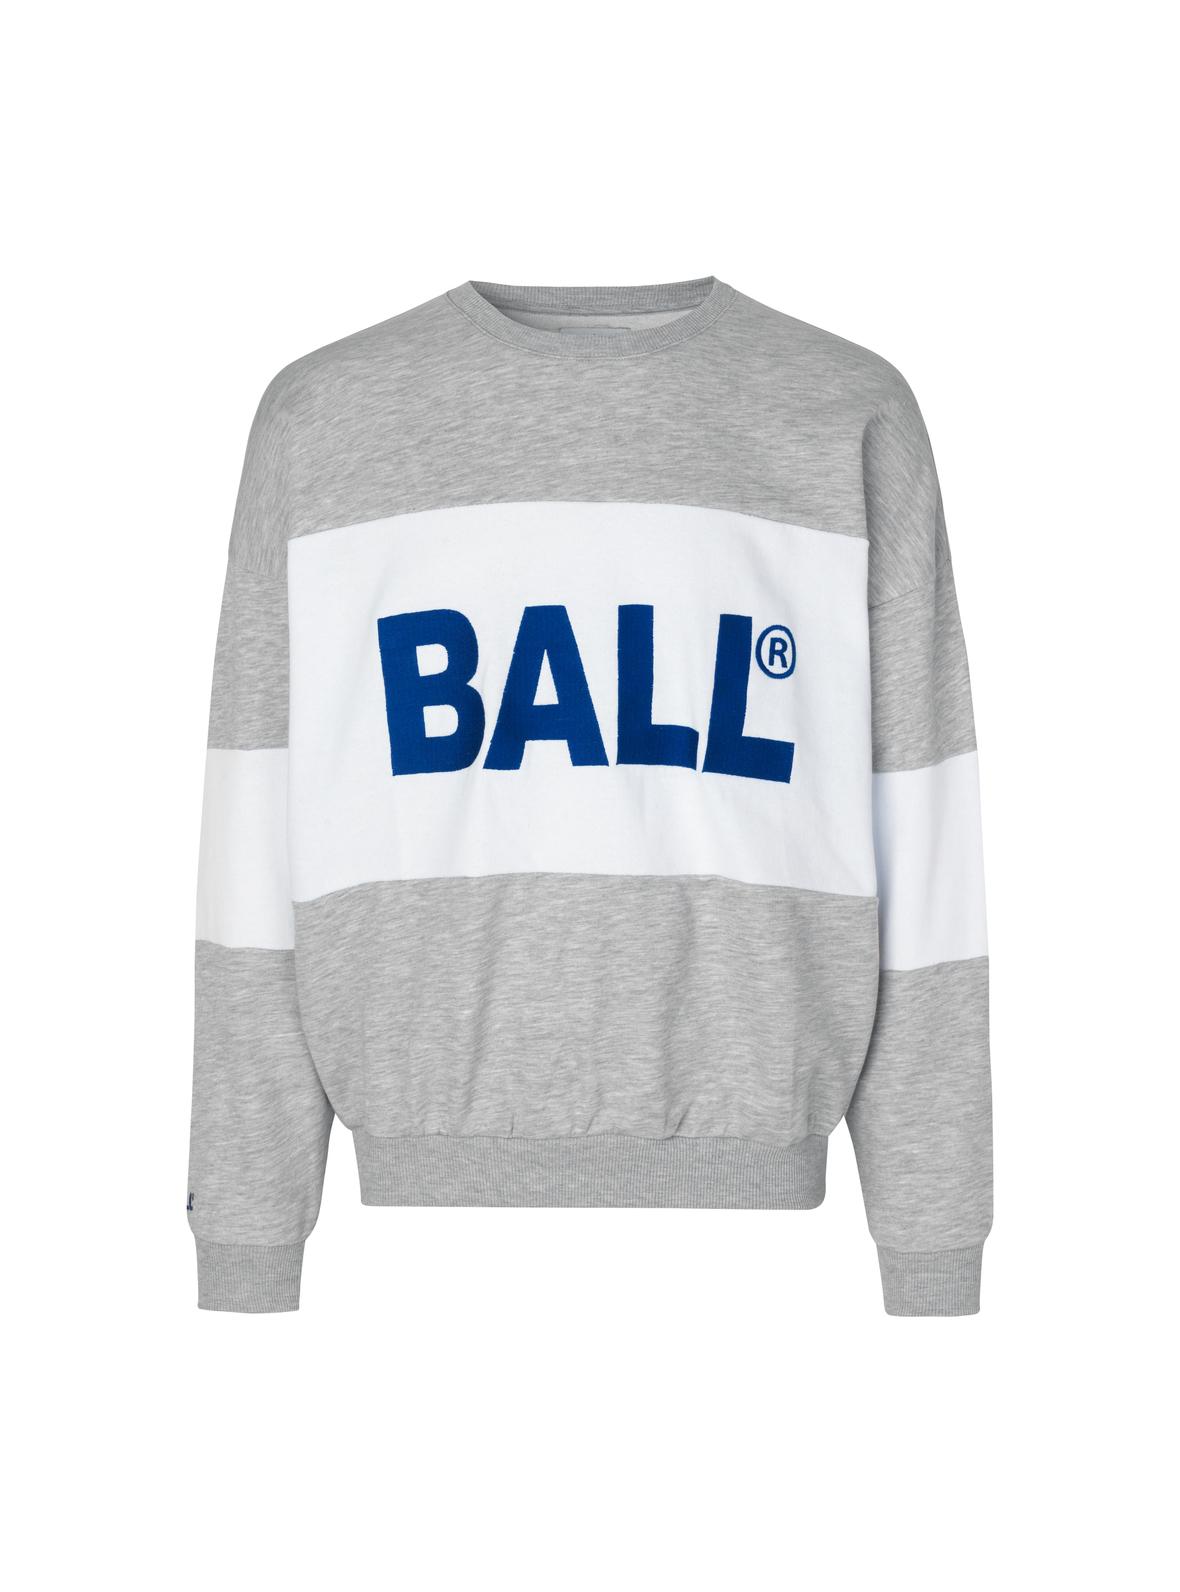 BALL Original Summer Crew Neck sweatshirt, light grey melange, xx-small